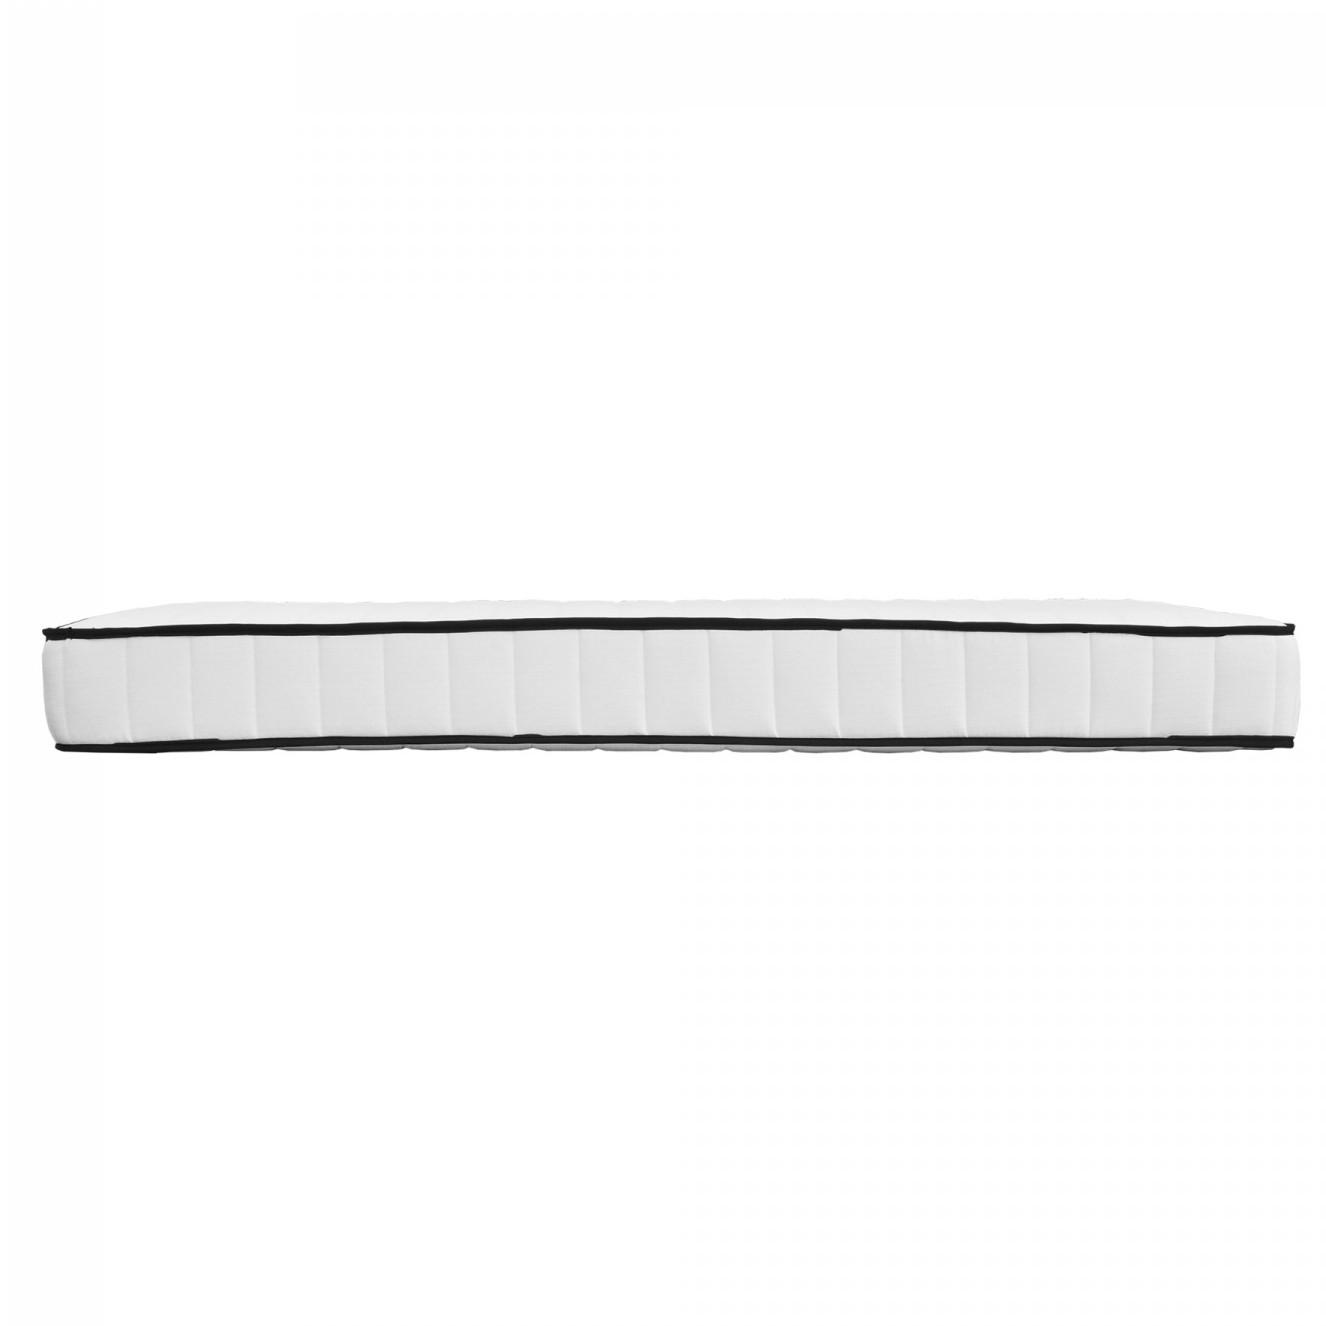 Saltea pat Bien Dormir Ecostar Rodos, ortopedica, cu arcuri, 160 x 200 cm